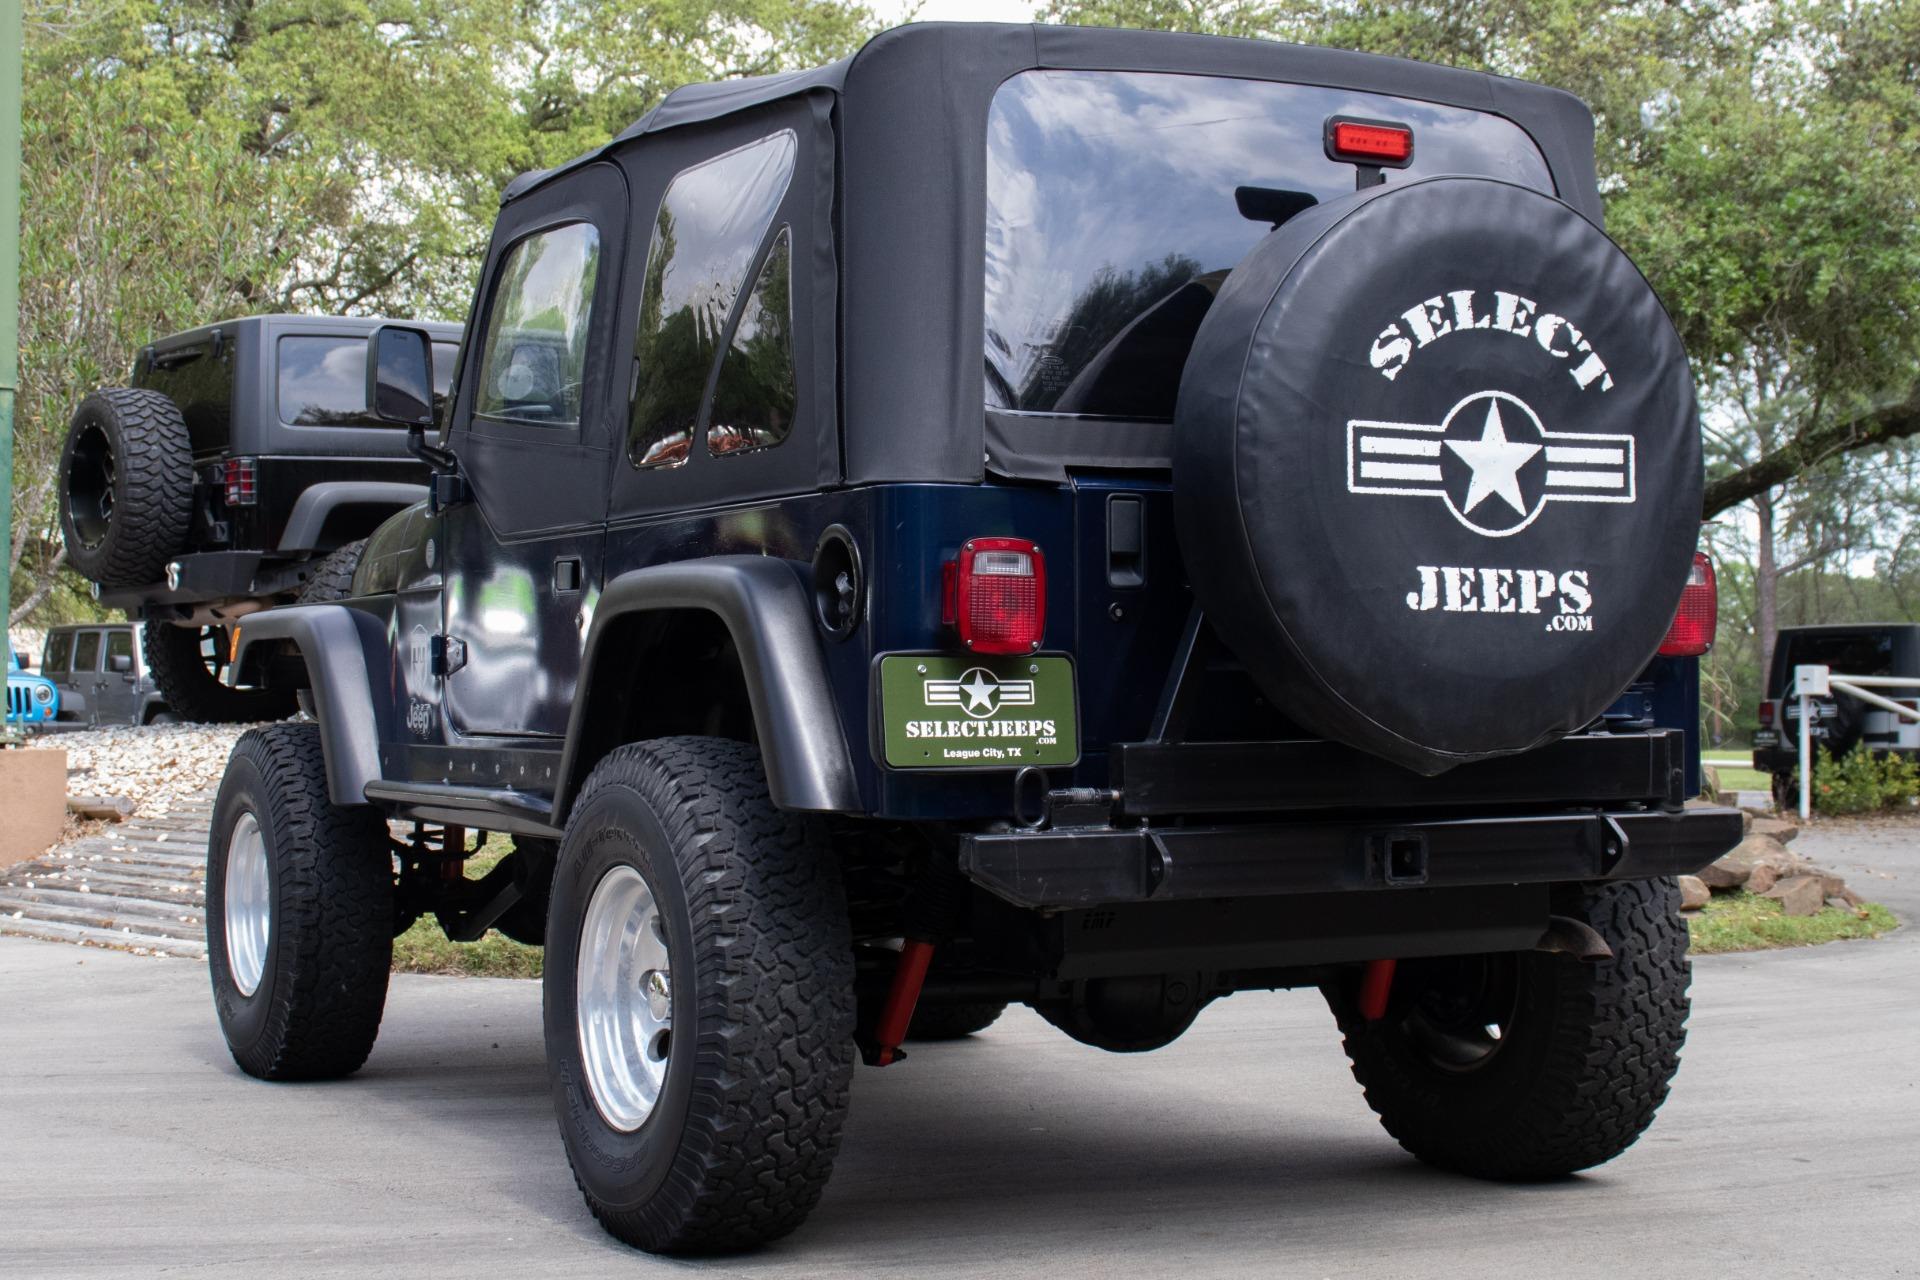 Used-2001-Jeep-Wrangler-SE